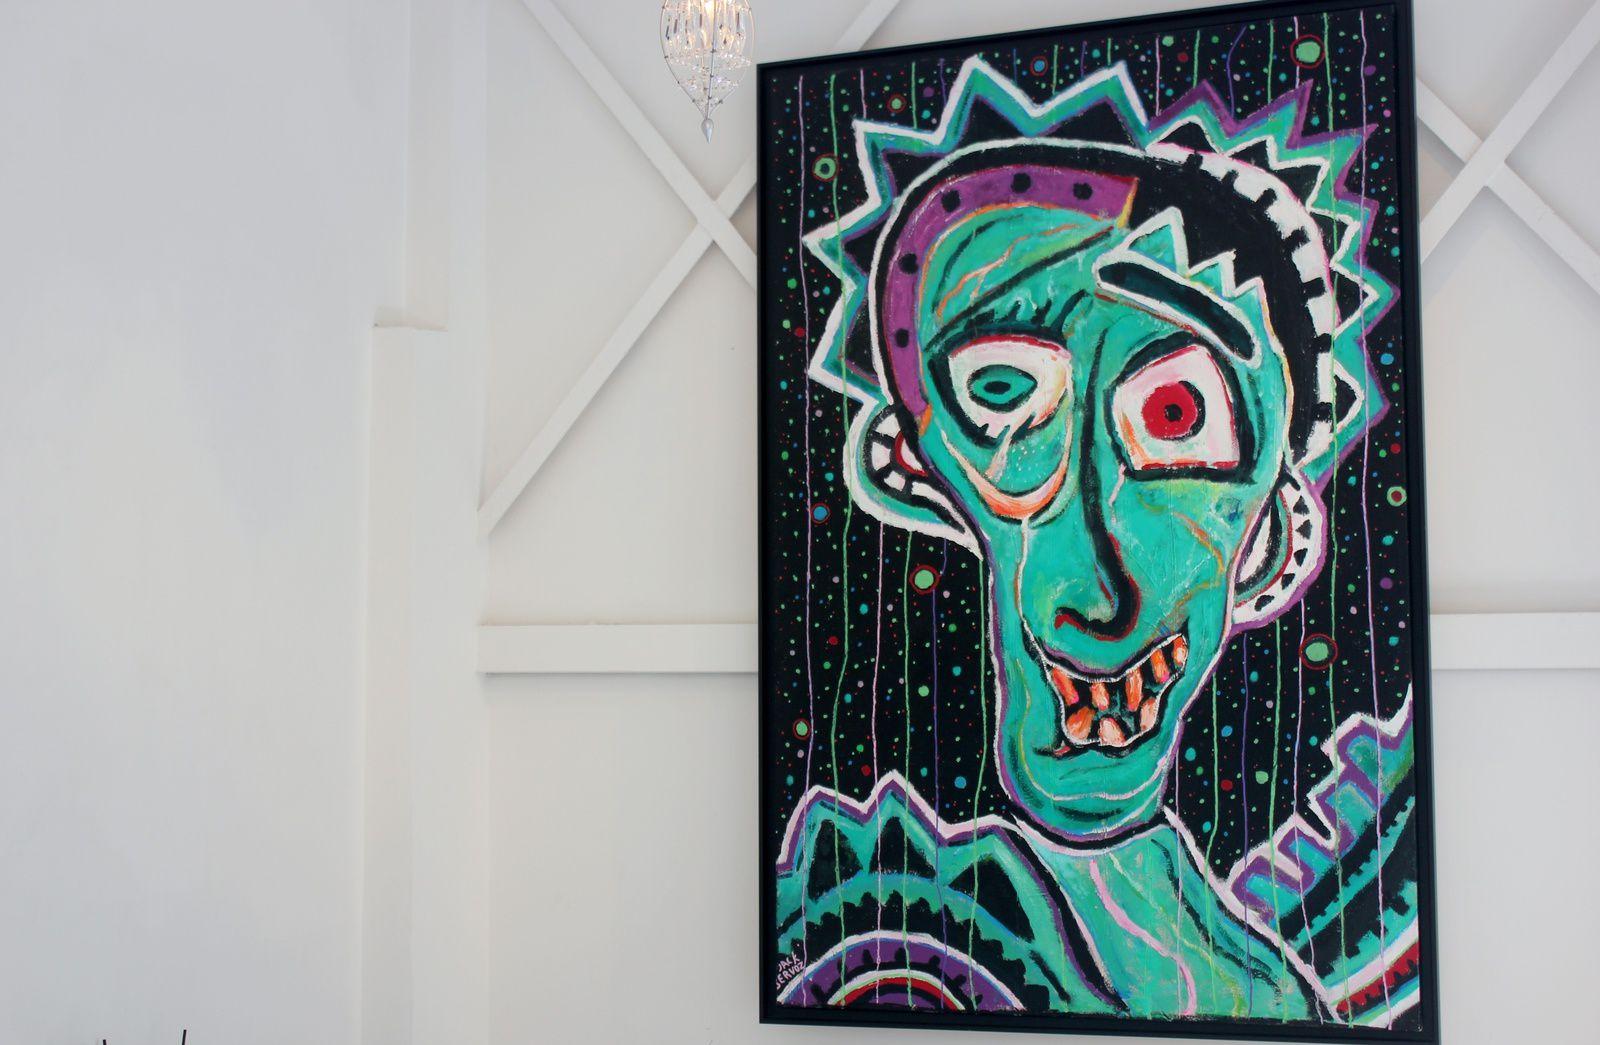 Jack Servoz et Aragon....................... Oeuvre de Servoz exposée dans la galerie